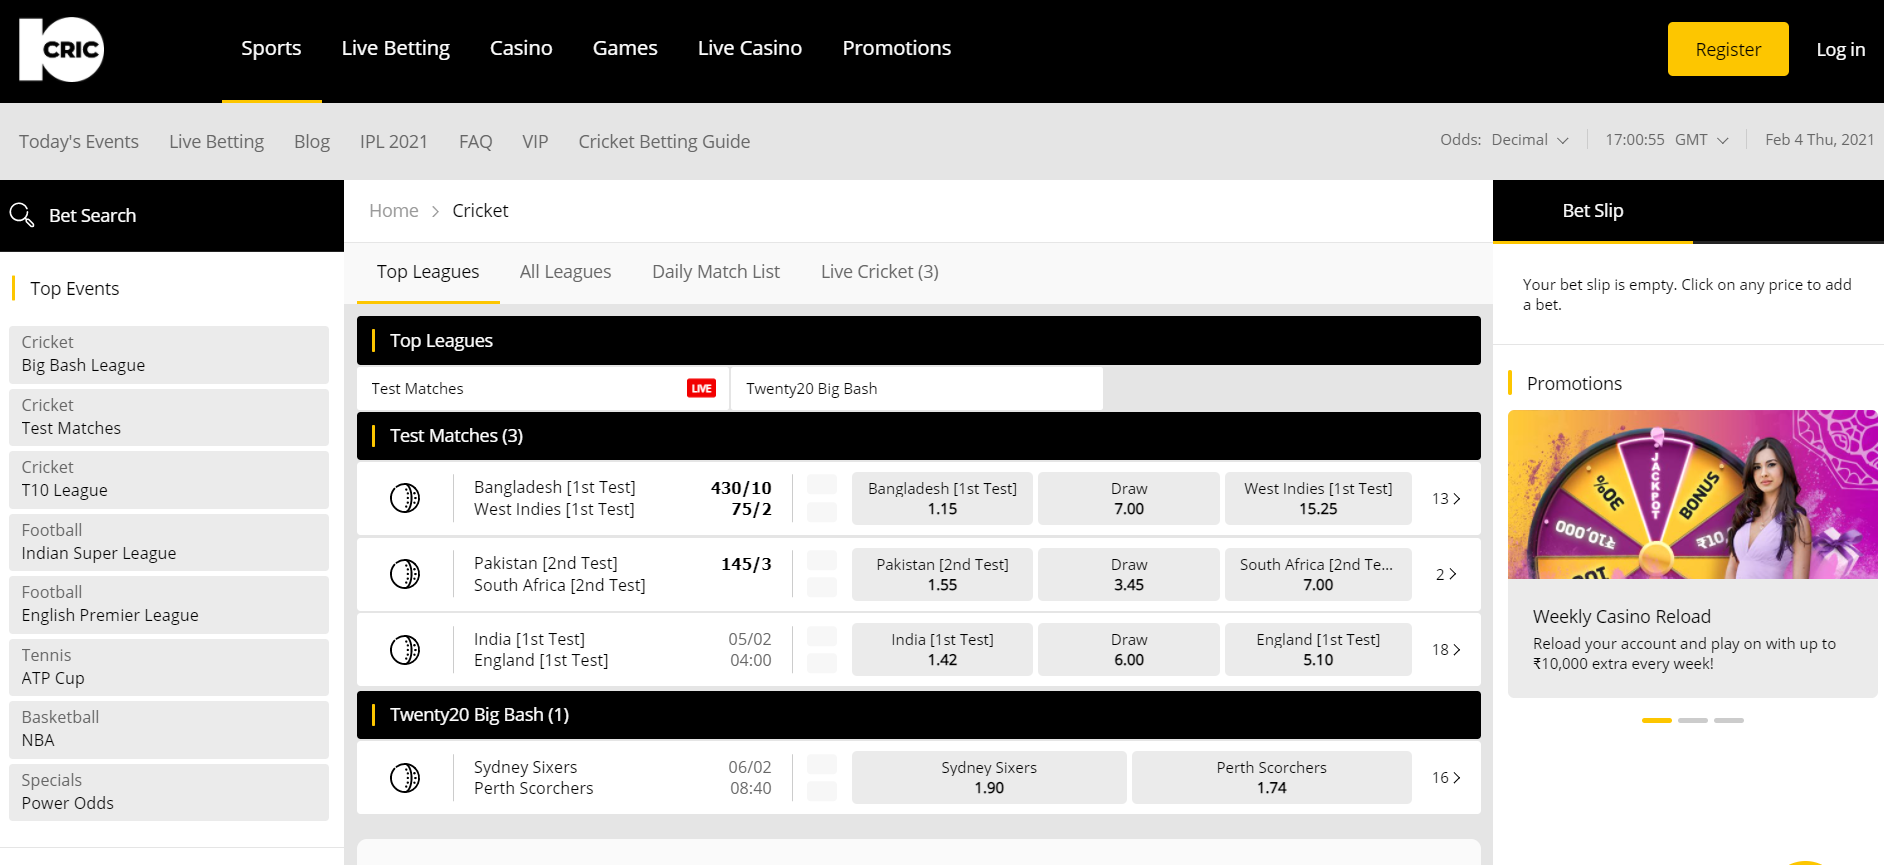 Top IPL Betting Sites - 10Cric markets